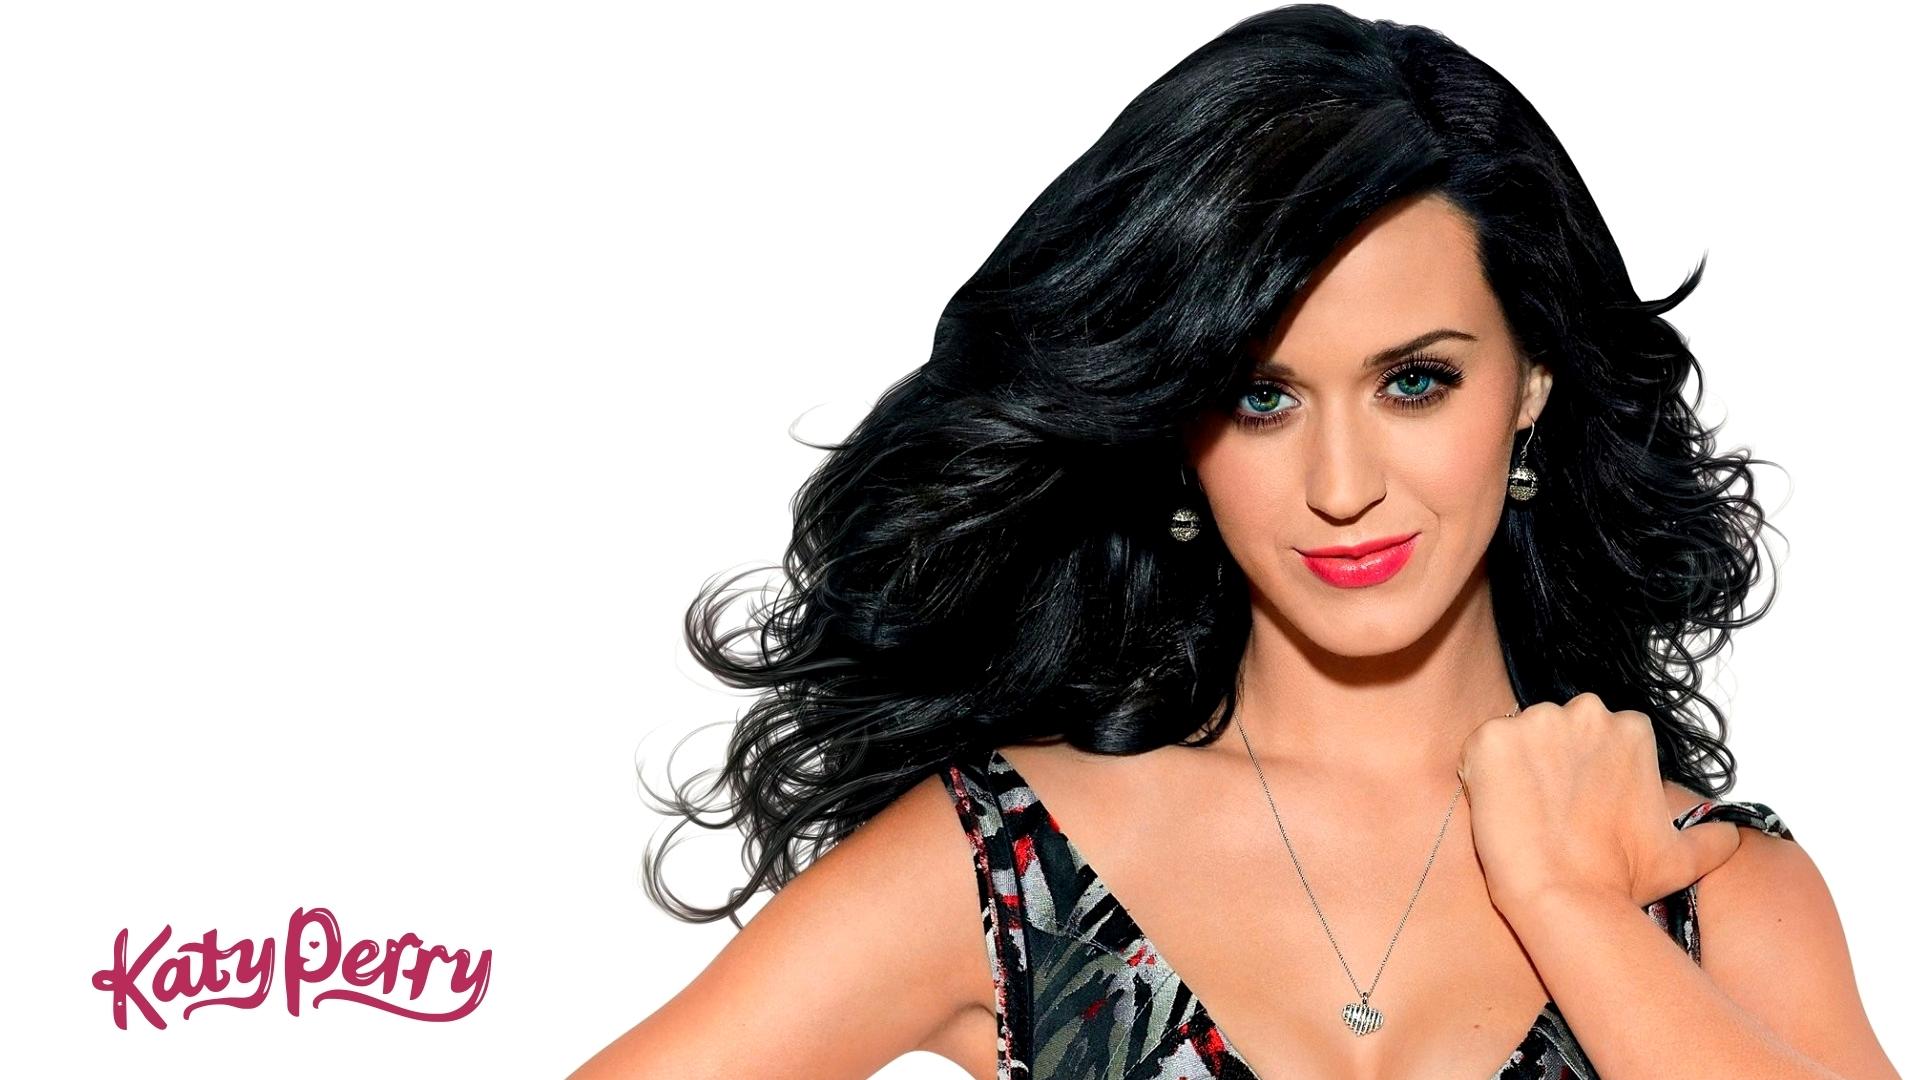 Katy Perry Katy Perry